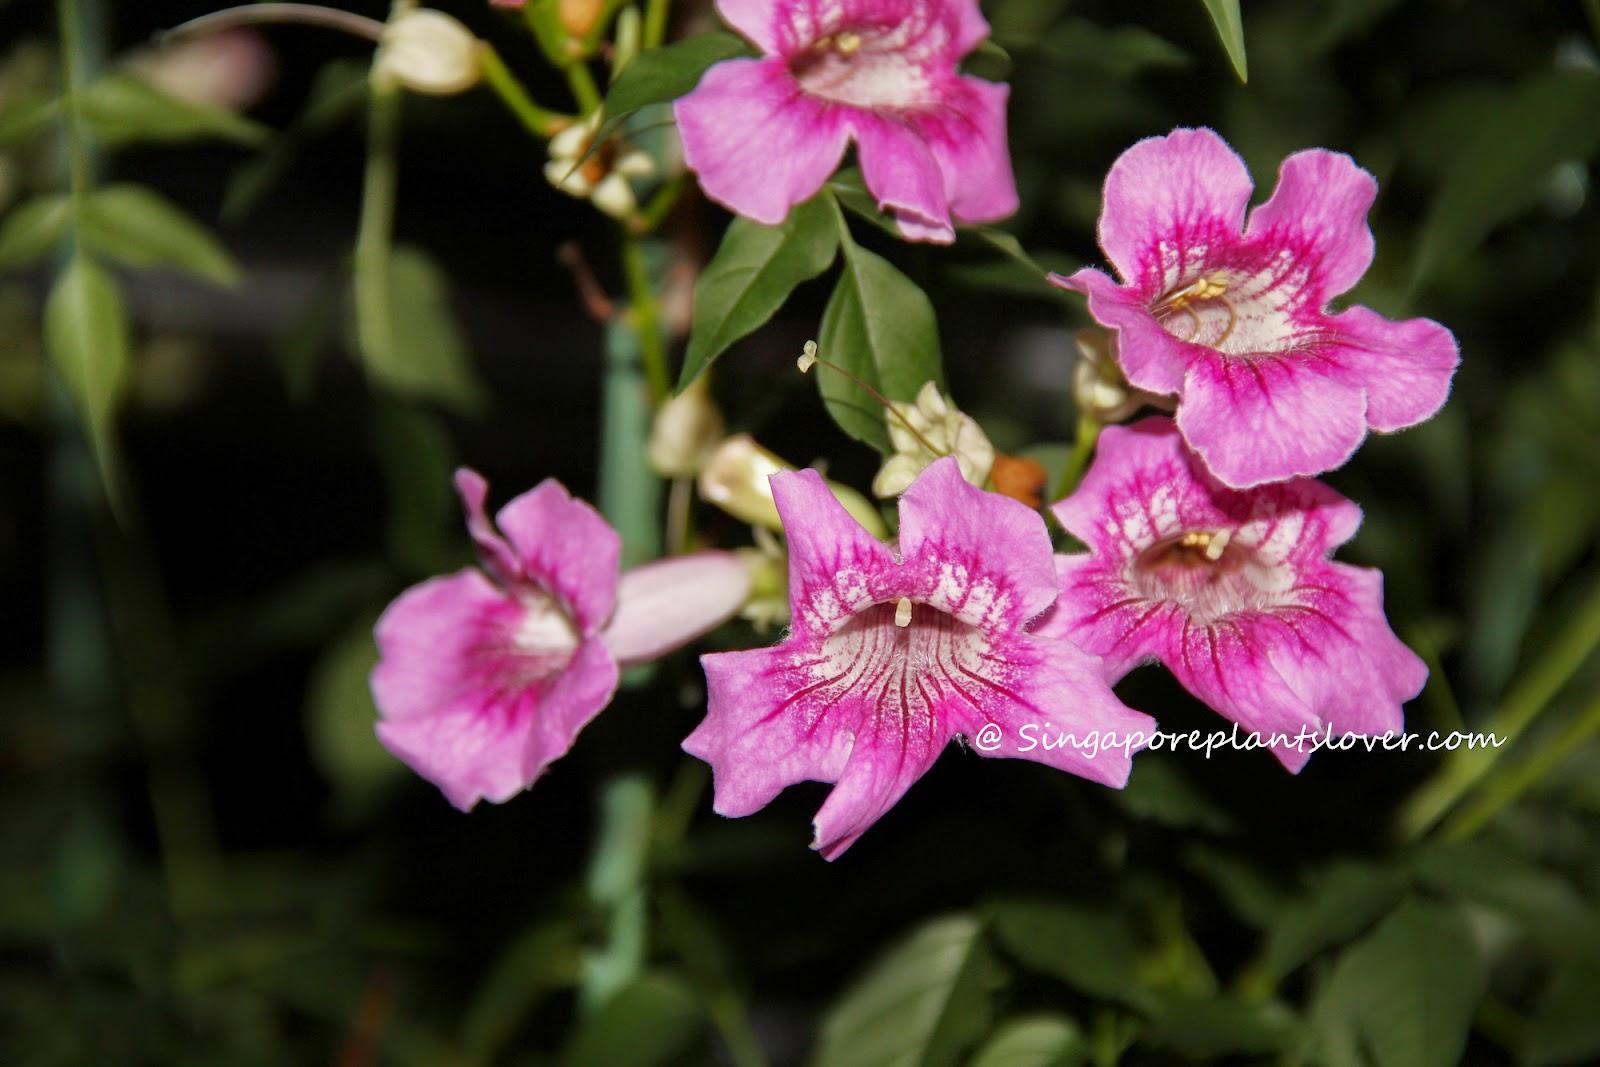 Singapore plants lover todays flowers trumpet vine todays flowers trumpet vine mightylinksfo